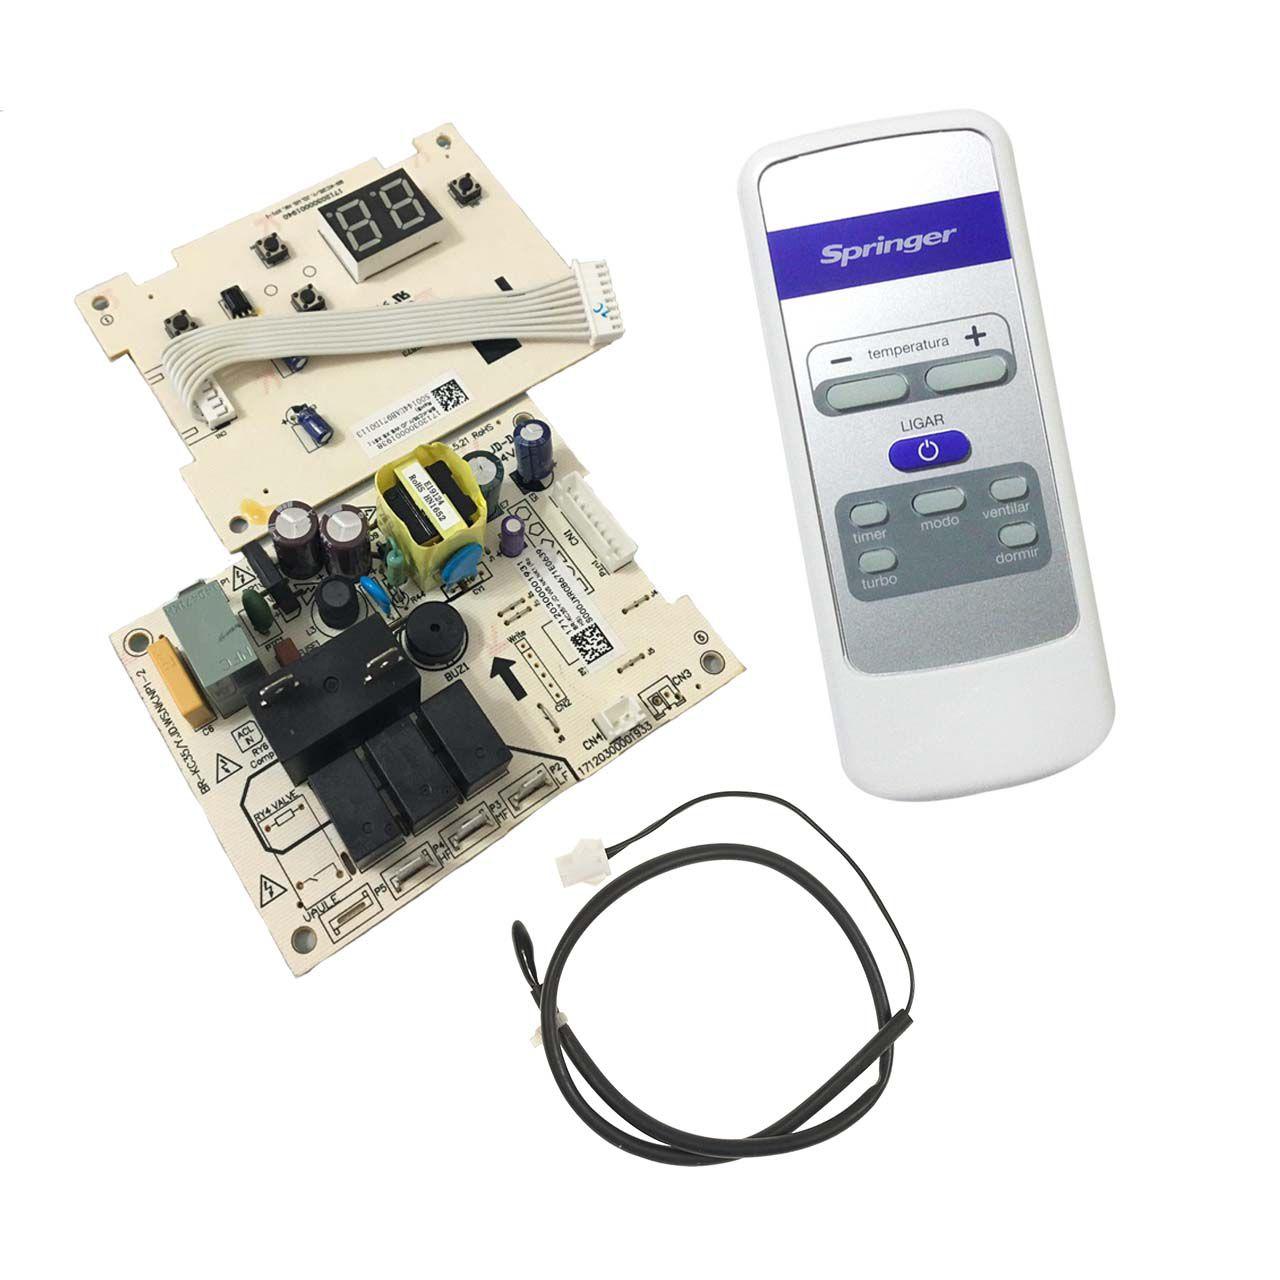 Kit Controle Completo Para ACJ Springer